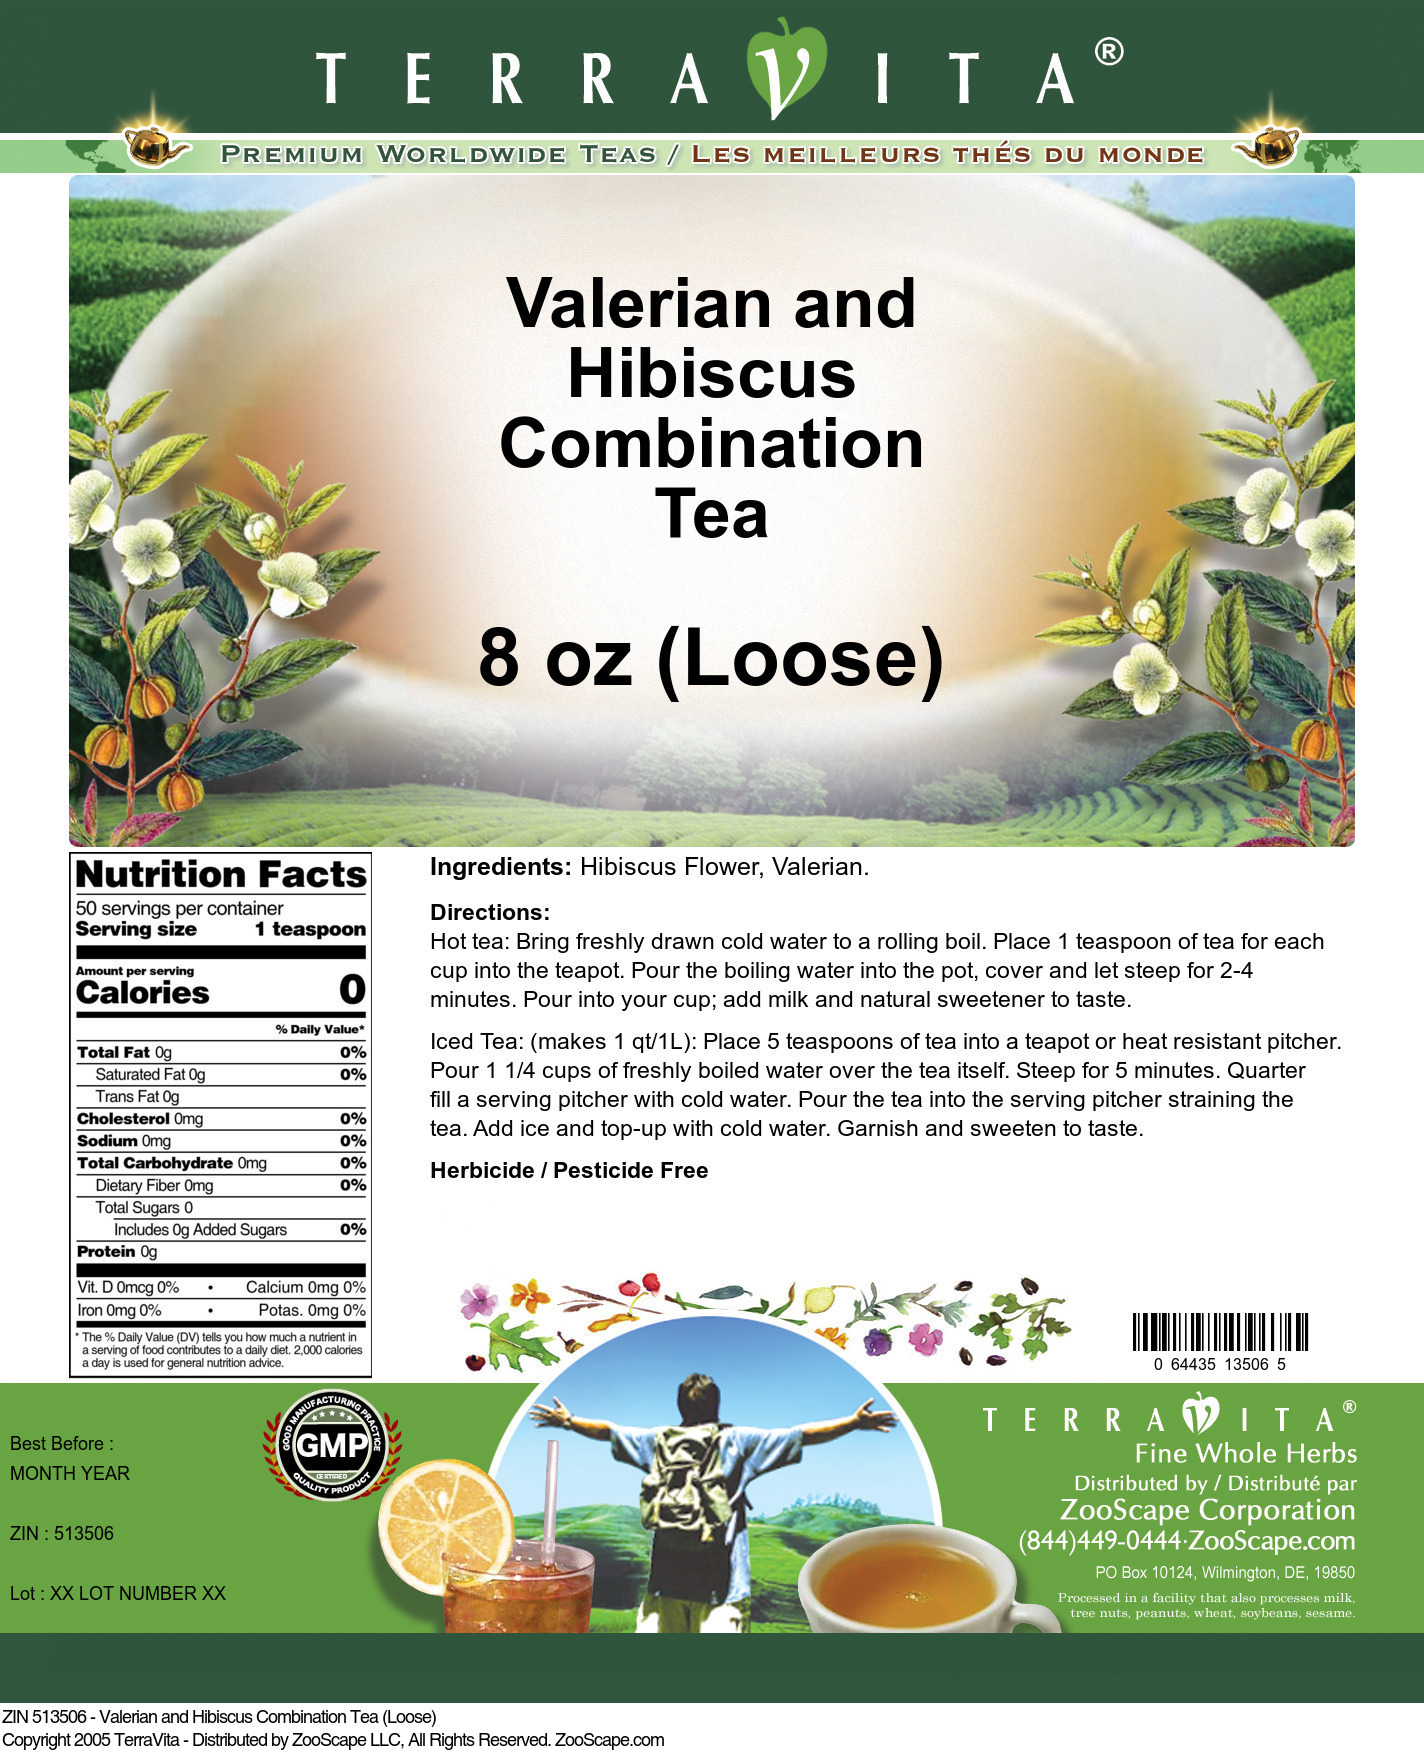 Valerian and Hibiscus Combination Tea (Loose)